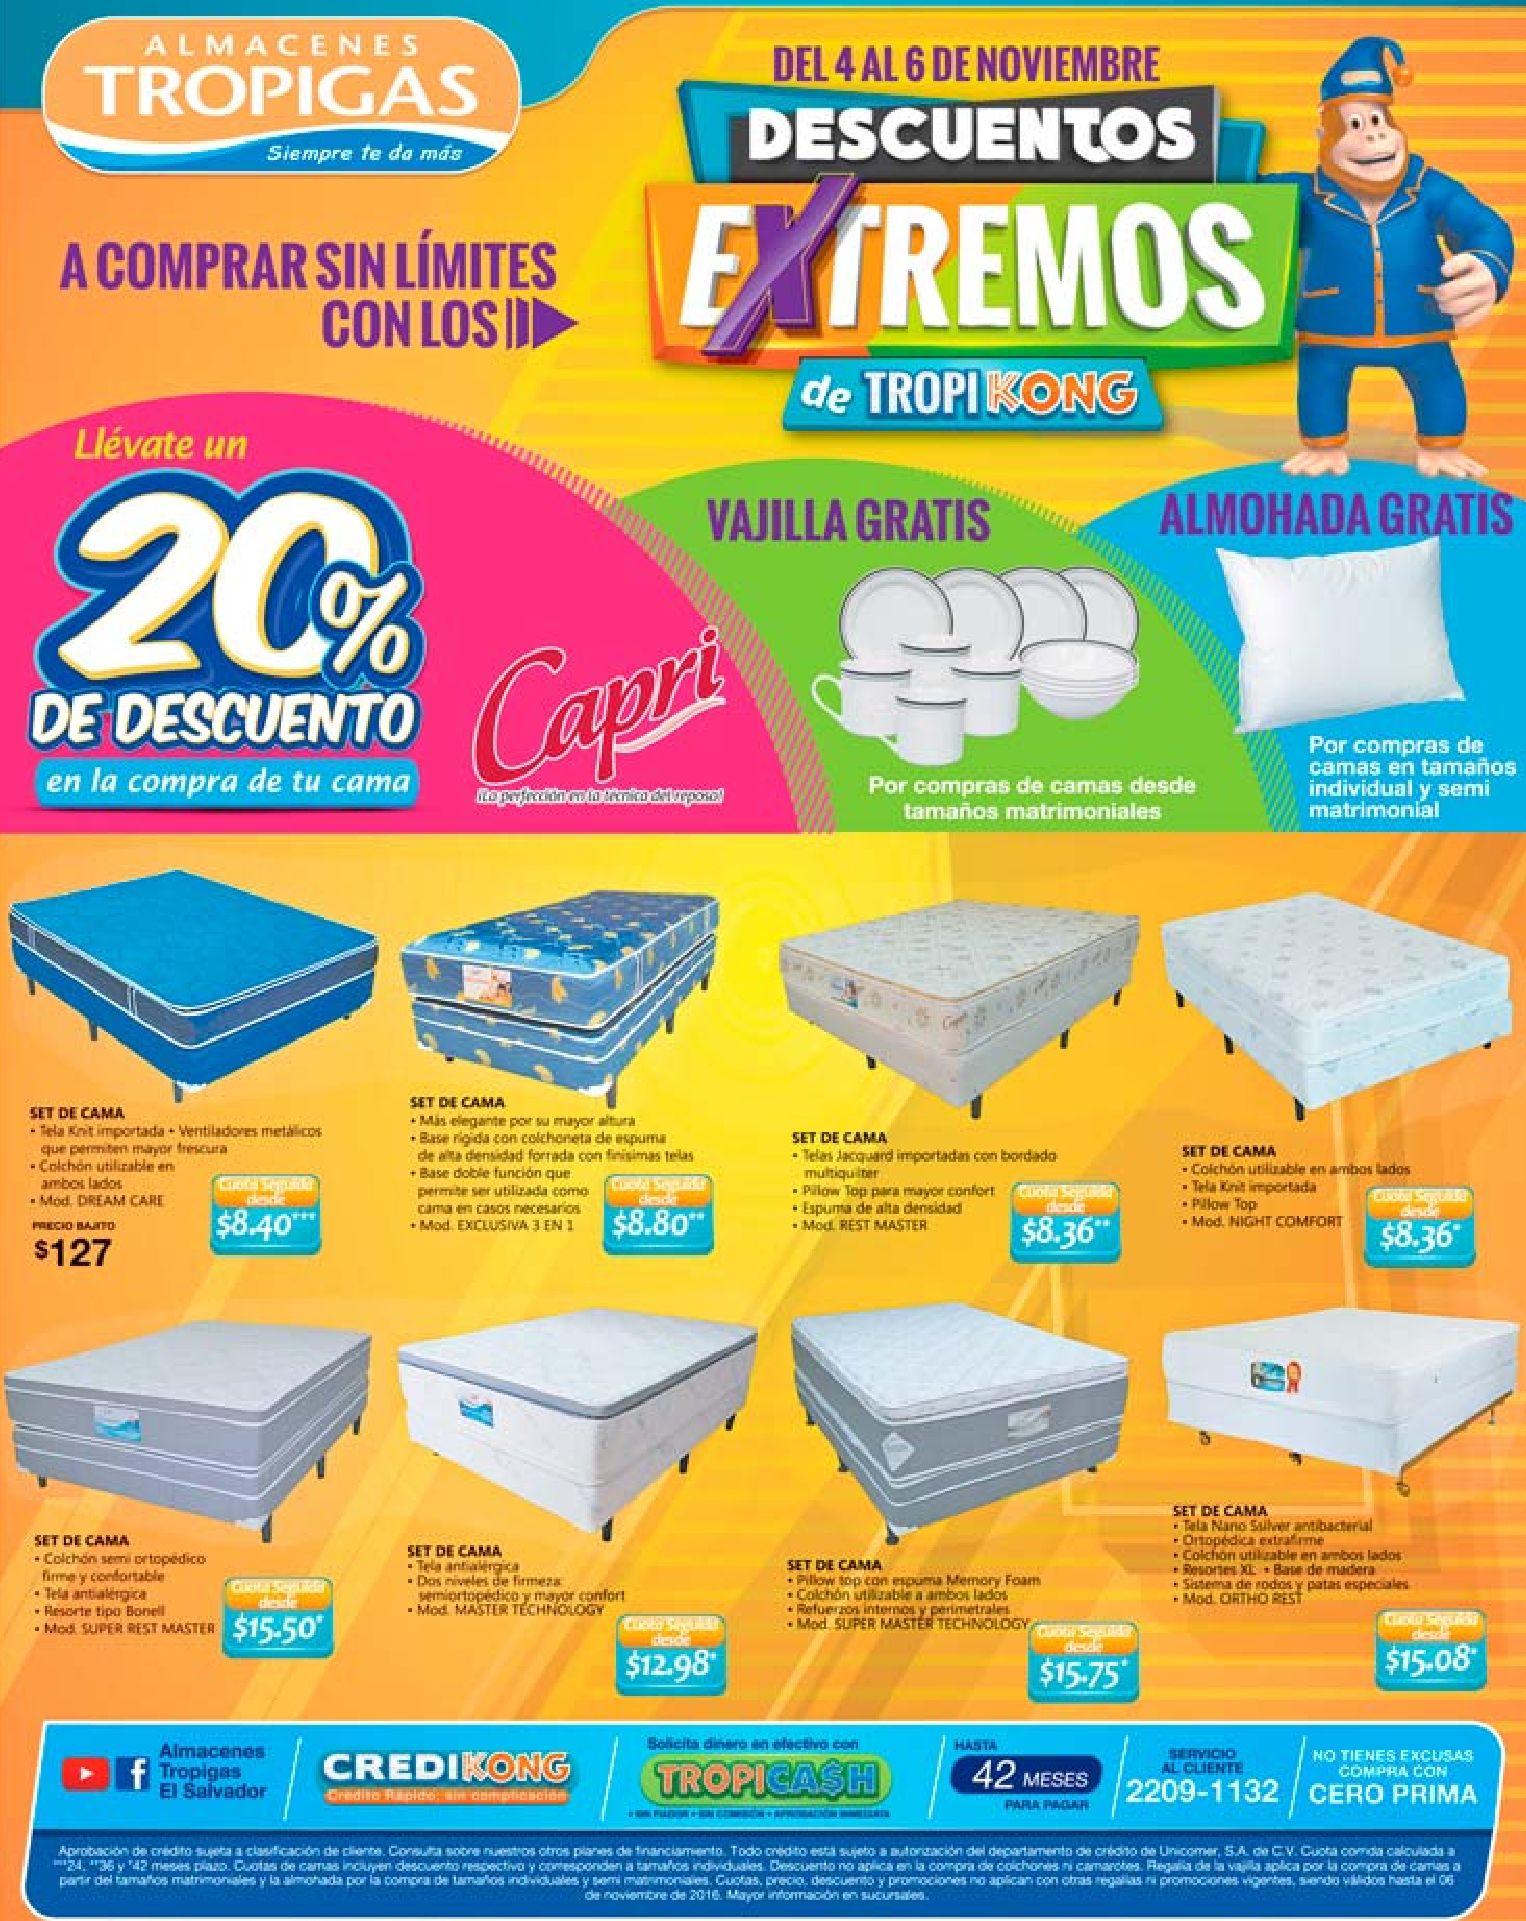 xtreme-discopounts-for-weekend-tropigas-04nov16